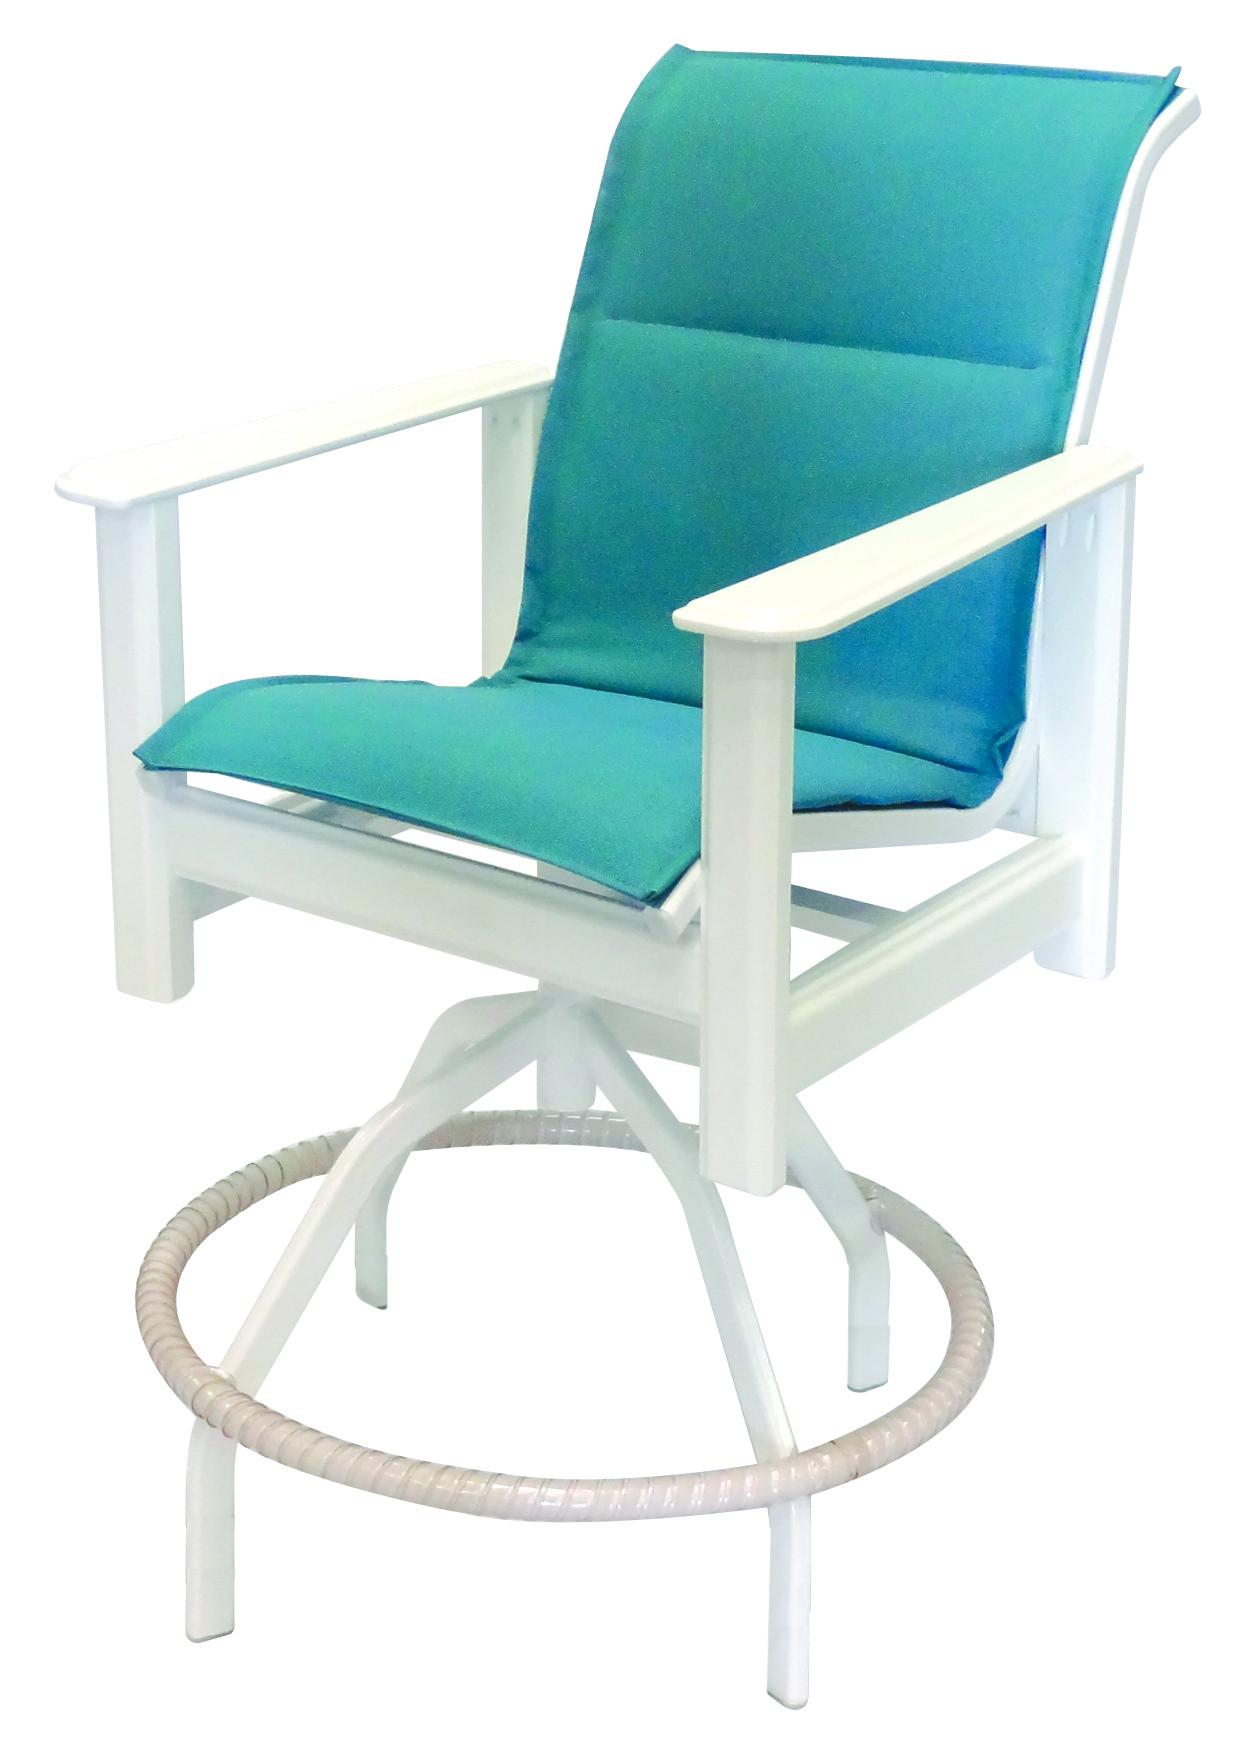 New Windward Patio Furniture Inspirational